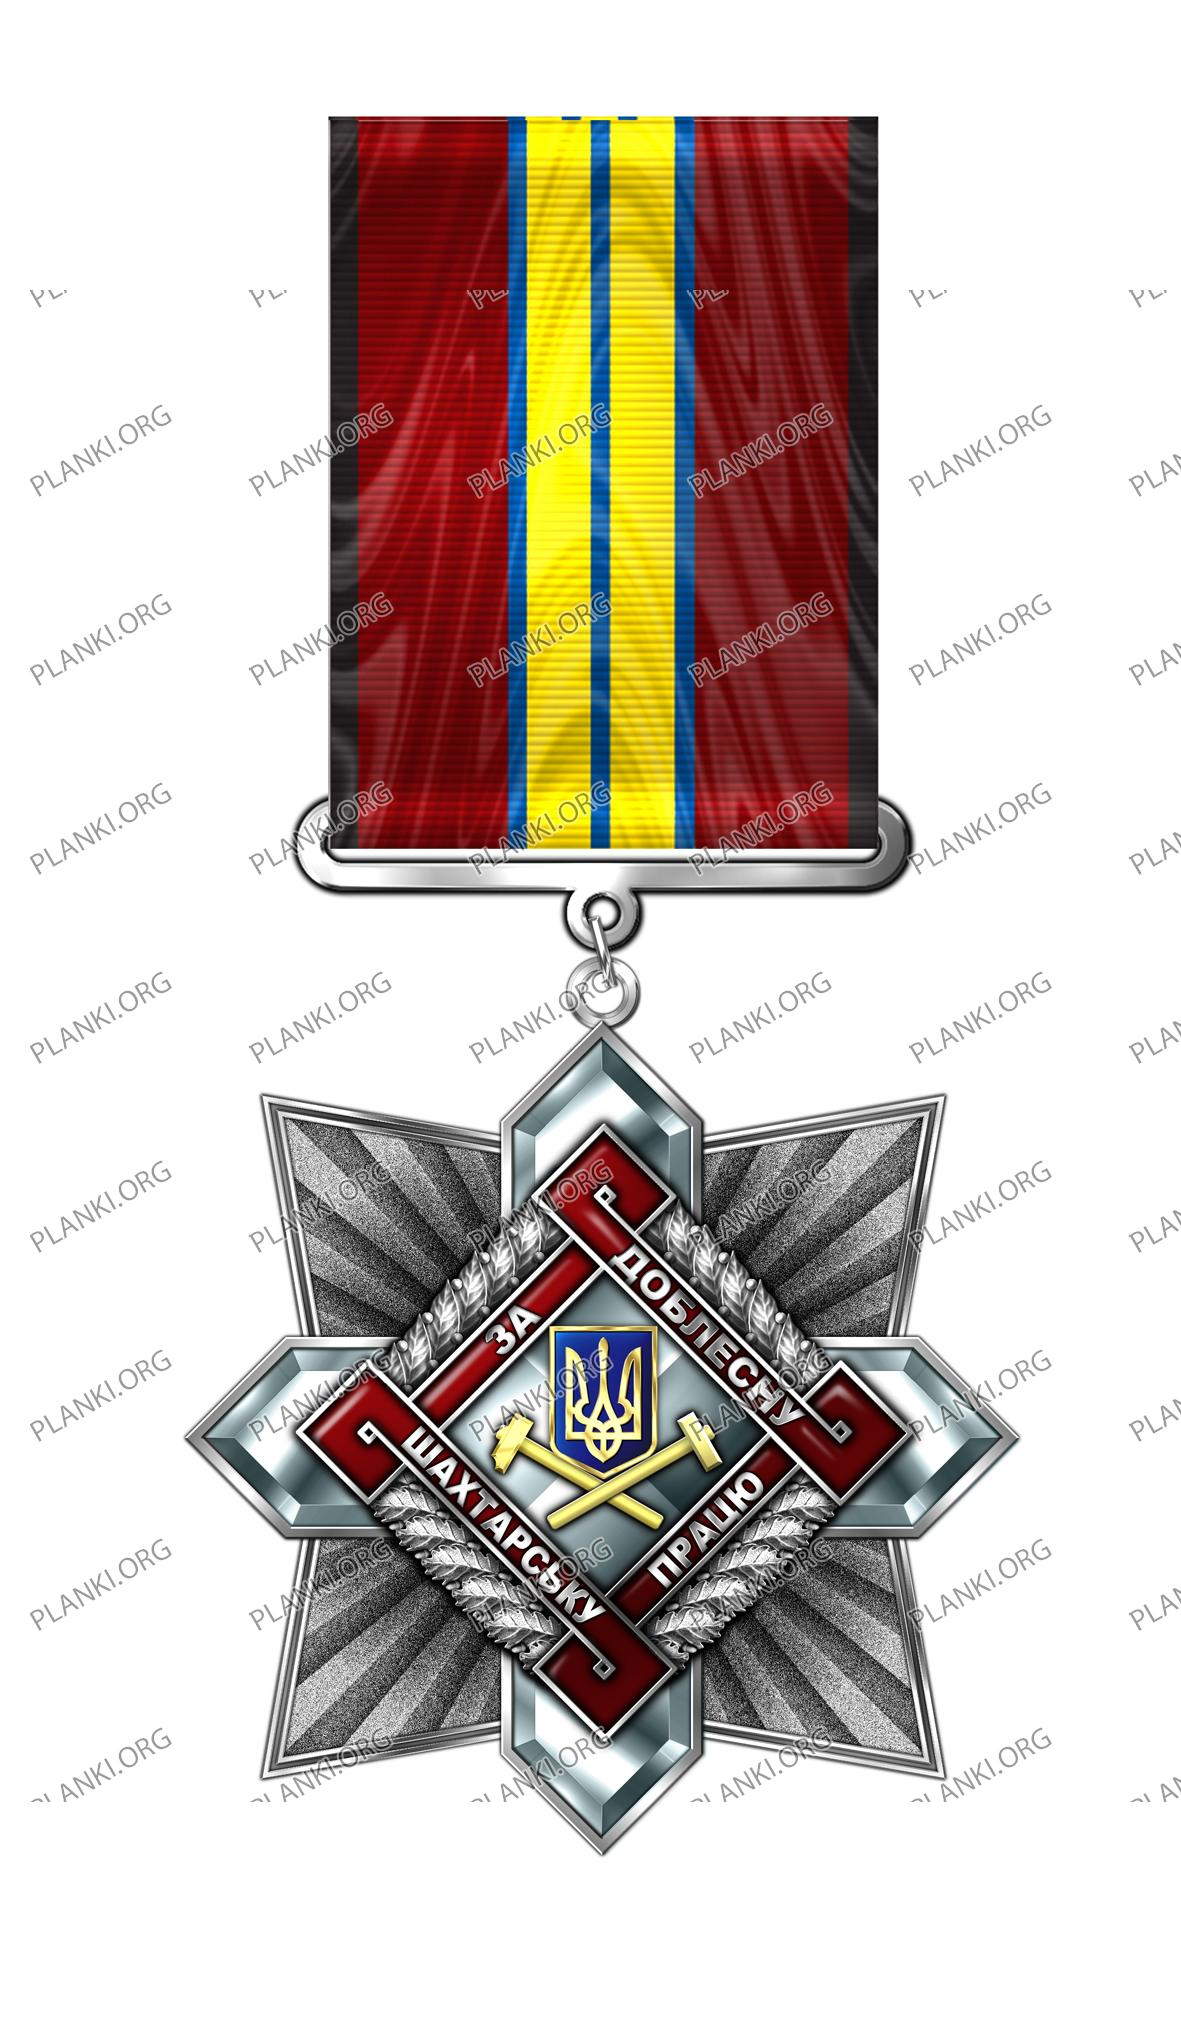 Орден За доблесну шахтарську працю II ступеня